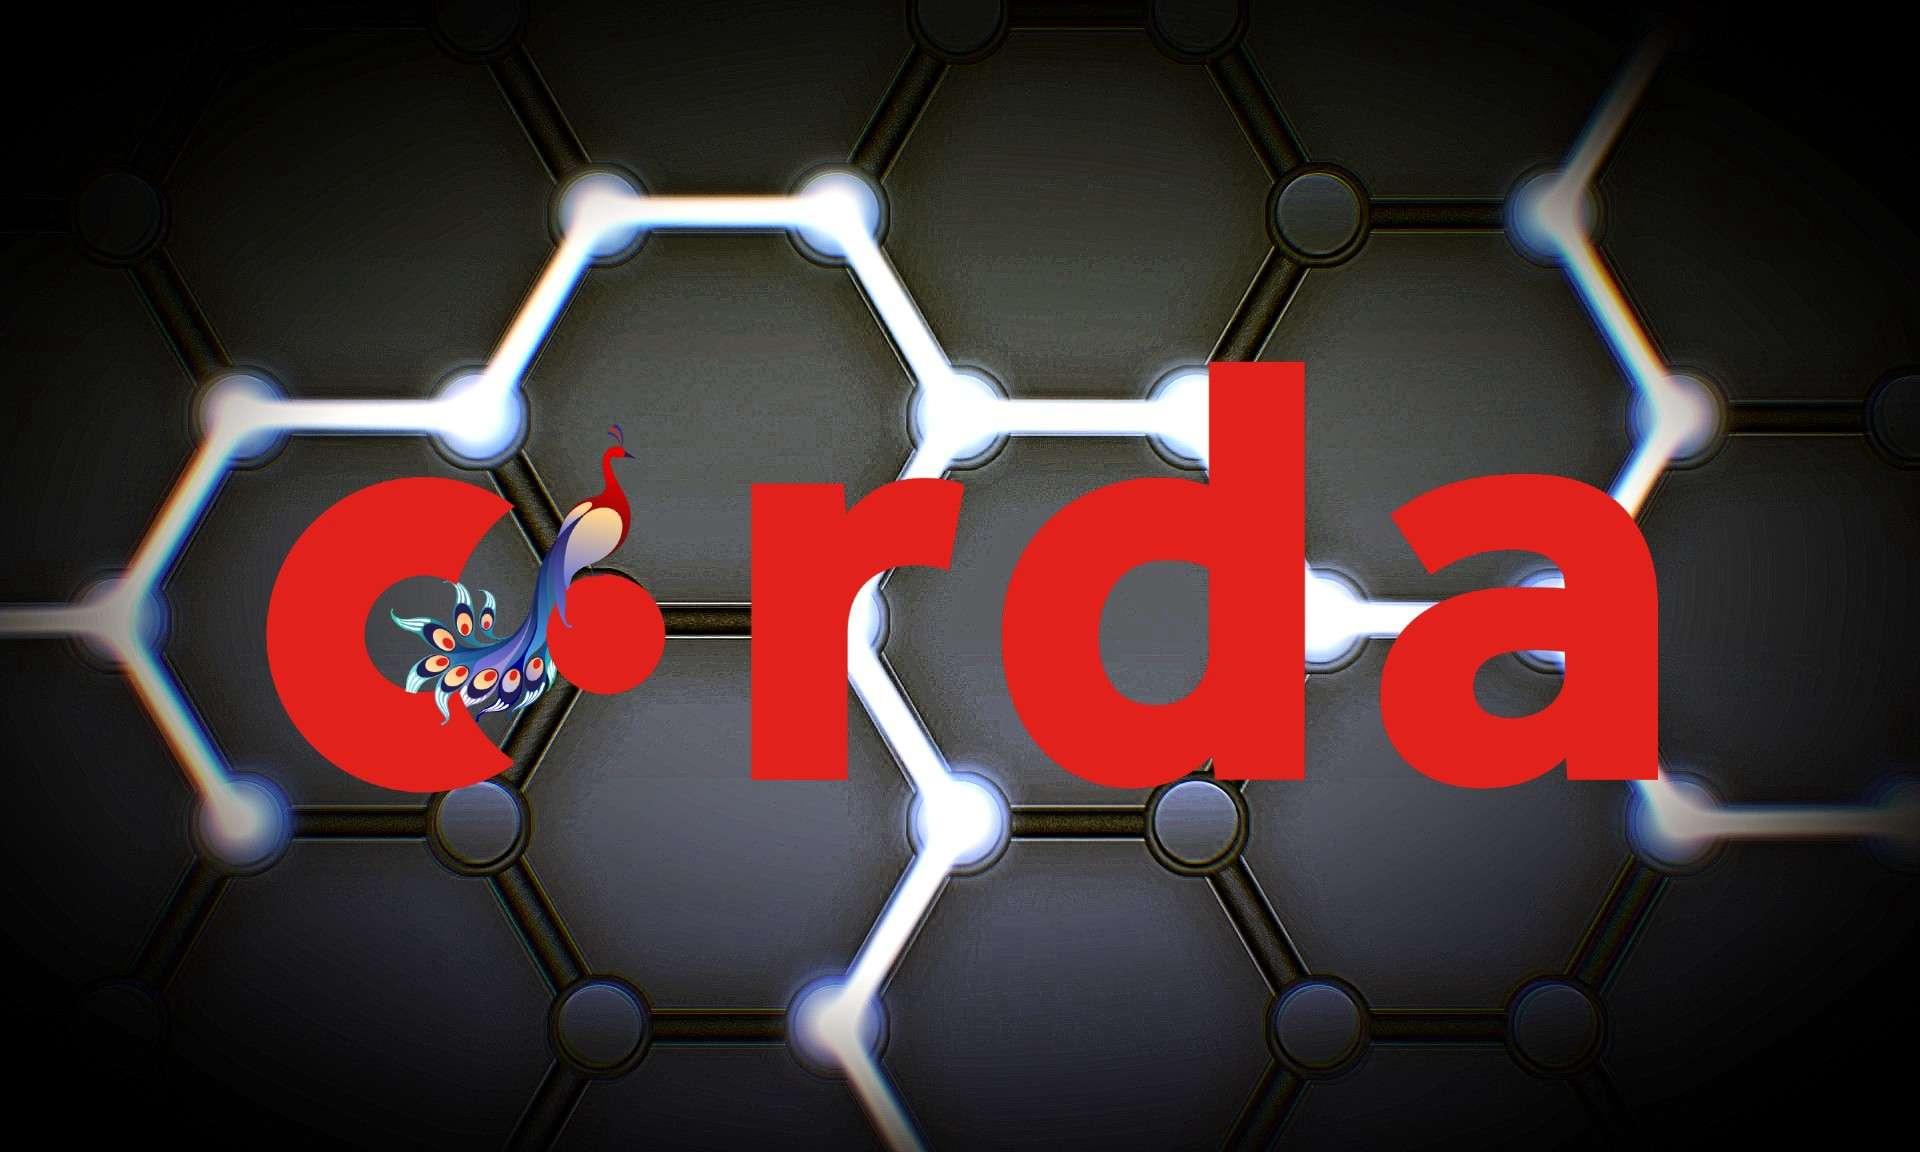 Corda developers